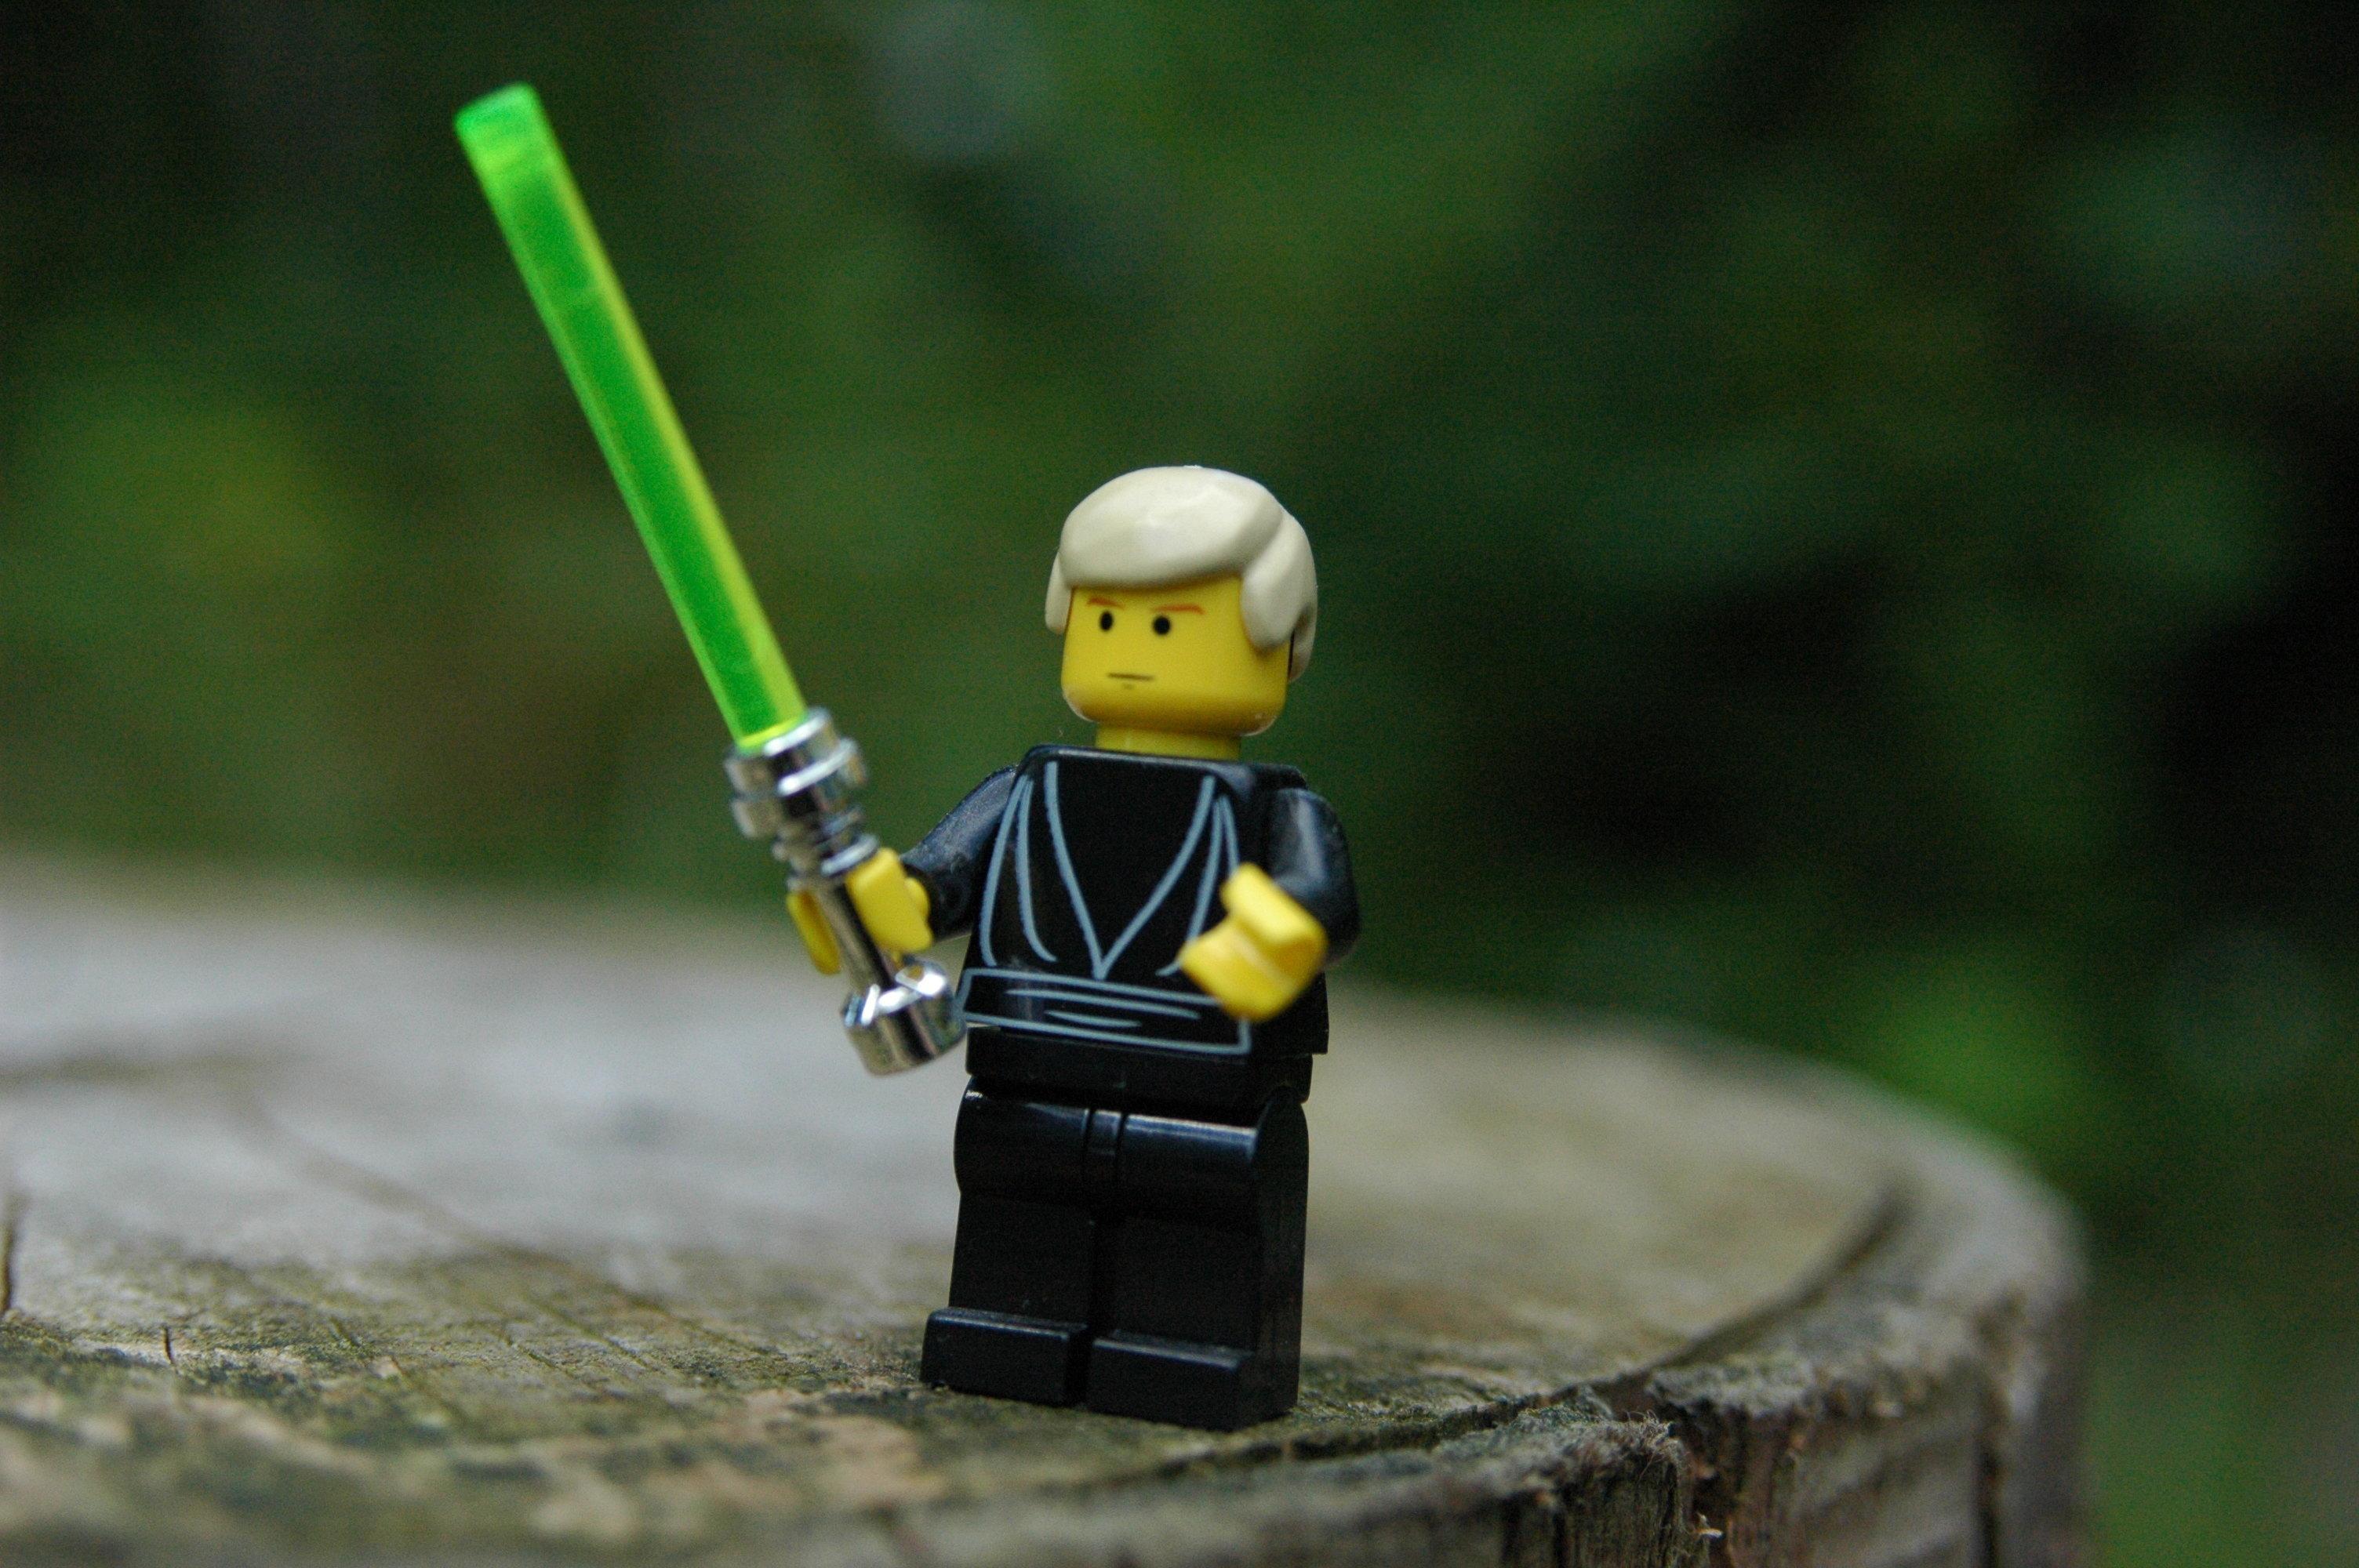 Lego Minifigure - Luke Skywalker from Return of the Jedi. Shot outdoors, natural lighting.